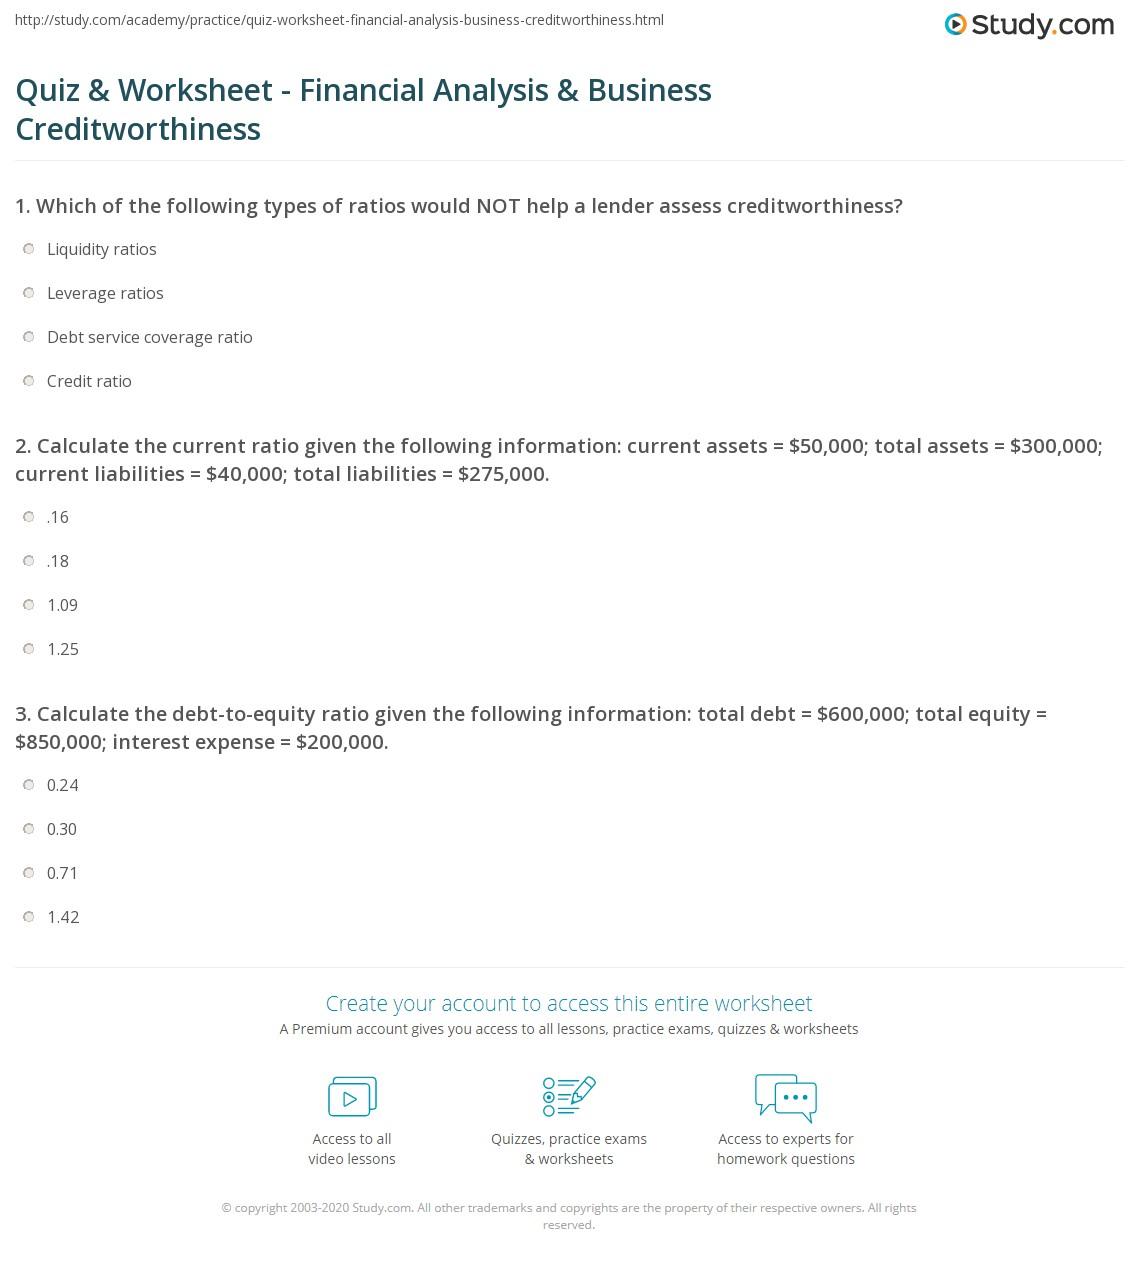 quiz worksheet financial analysis business creditworthiness. Black Bedroom Furniture Sets. Home Design Ideas